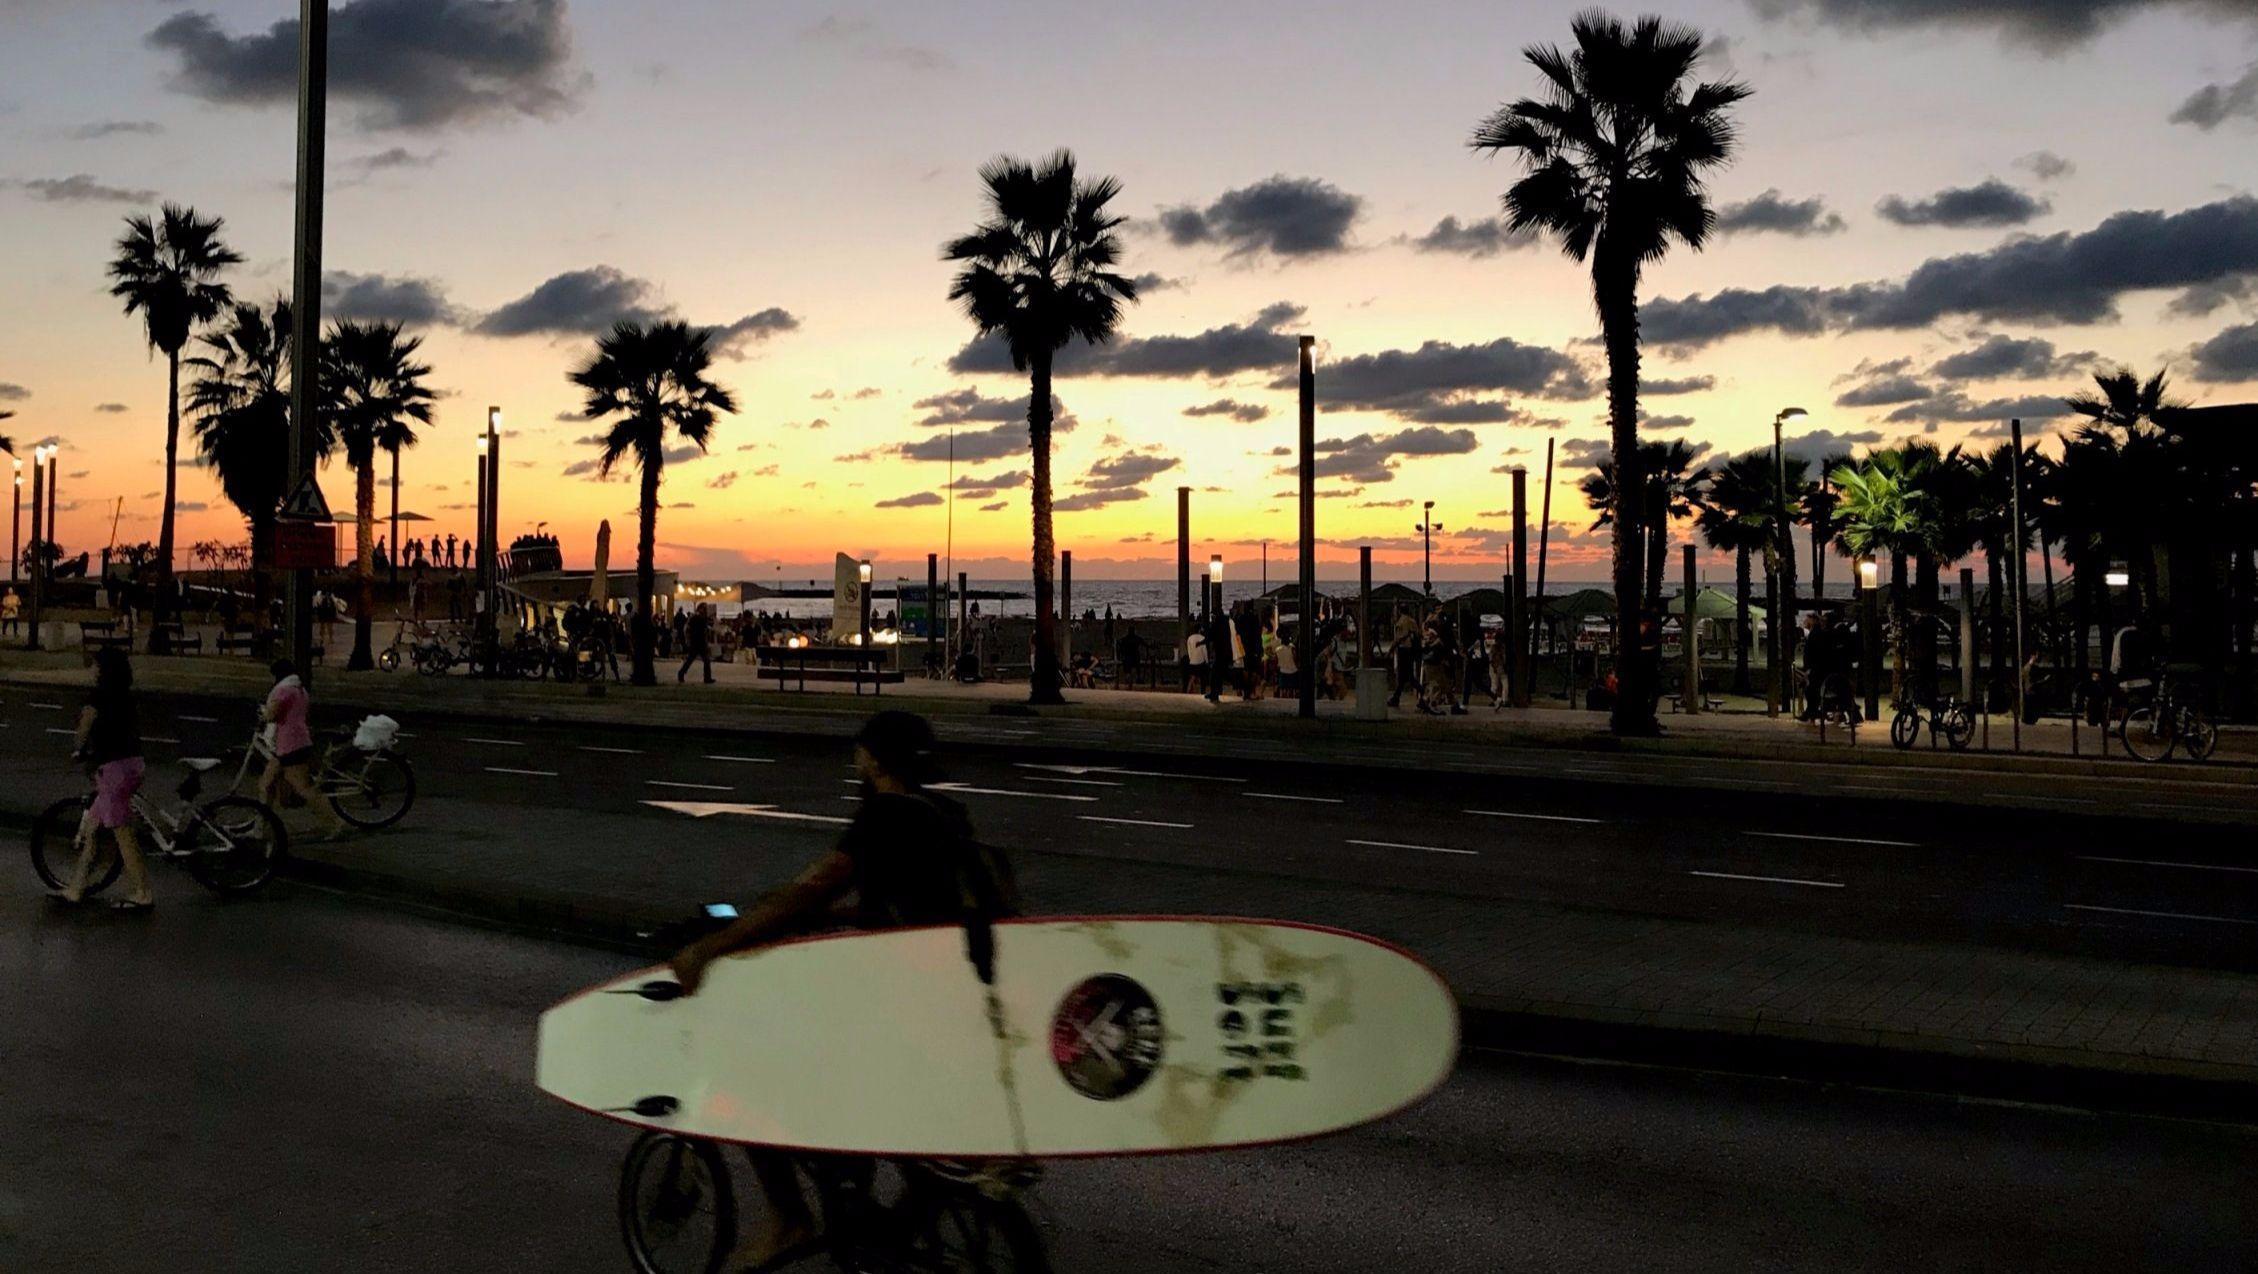 Am Stadtstrand von Tel Aviv